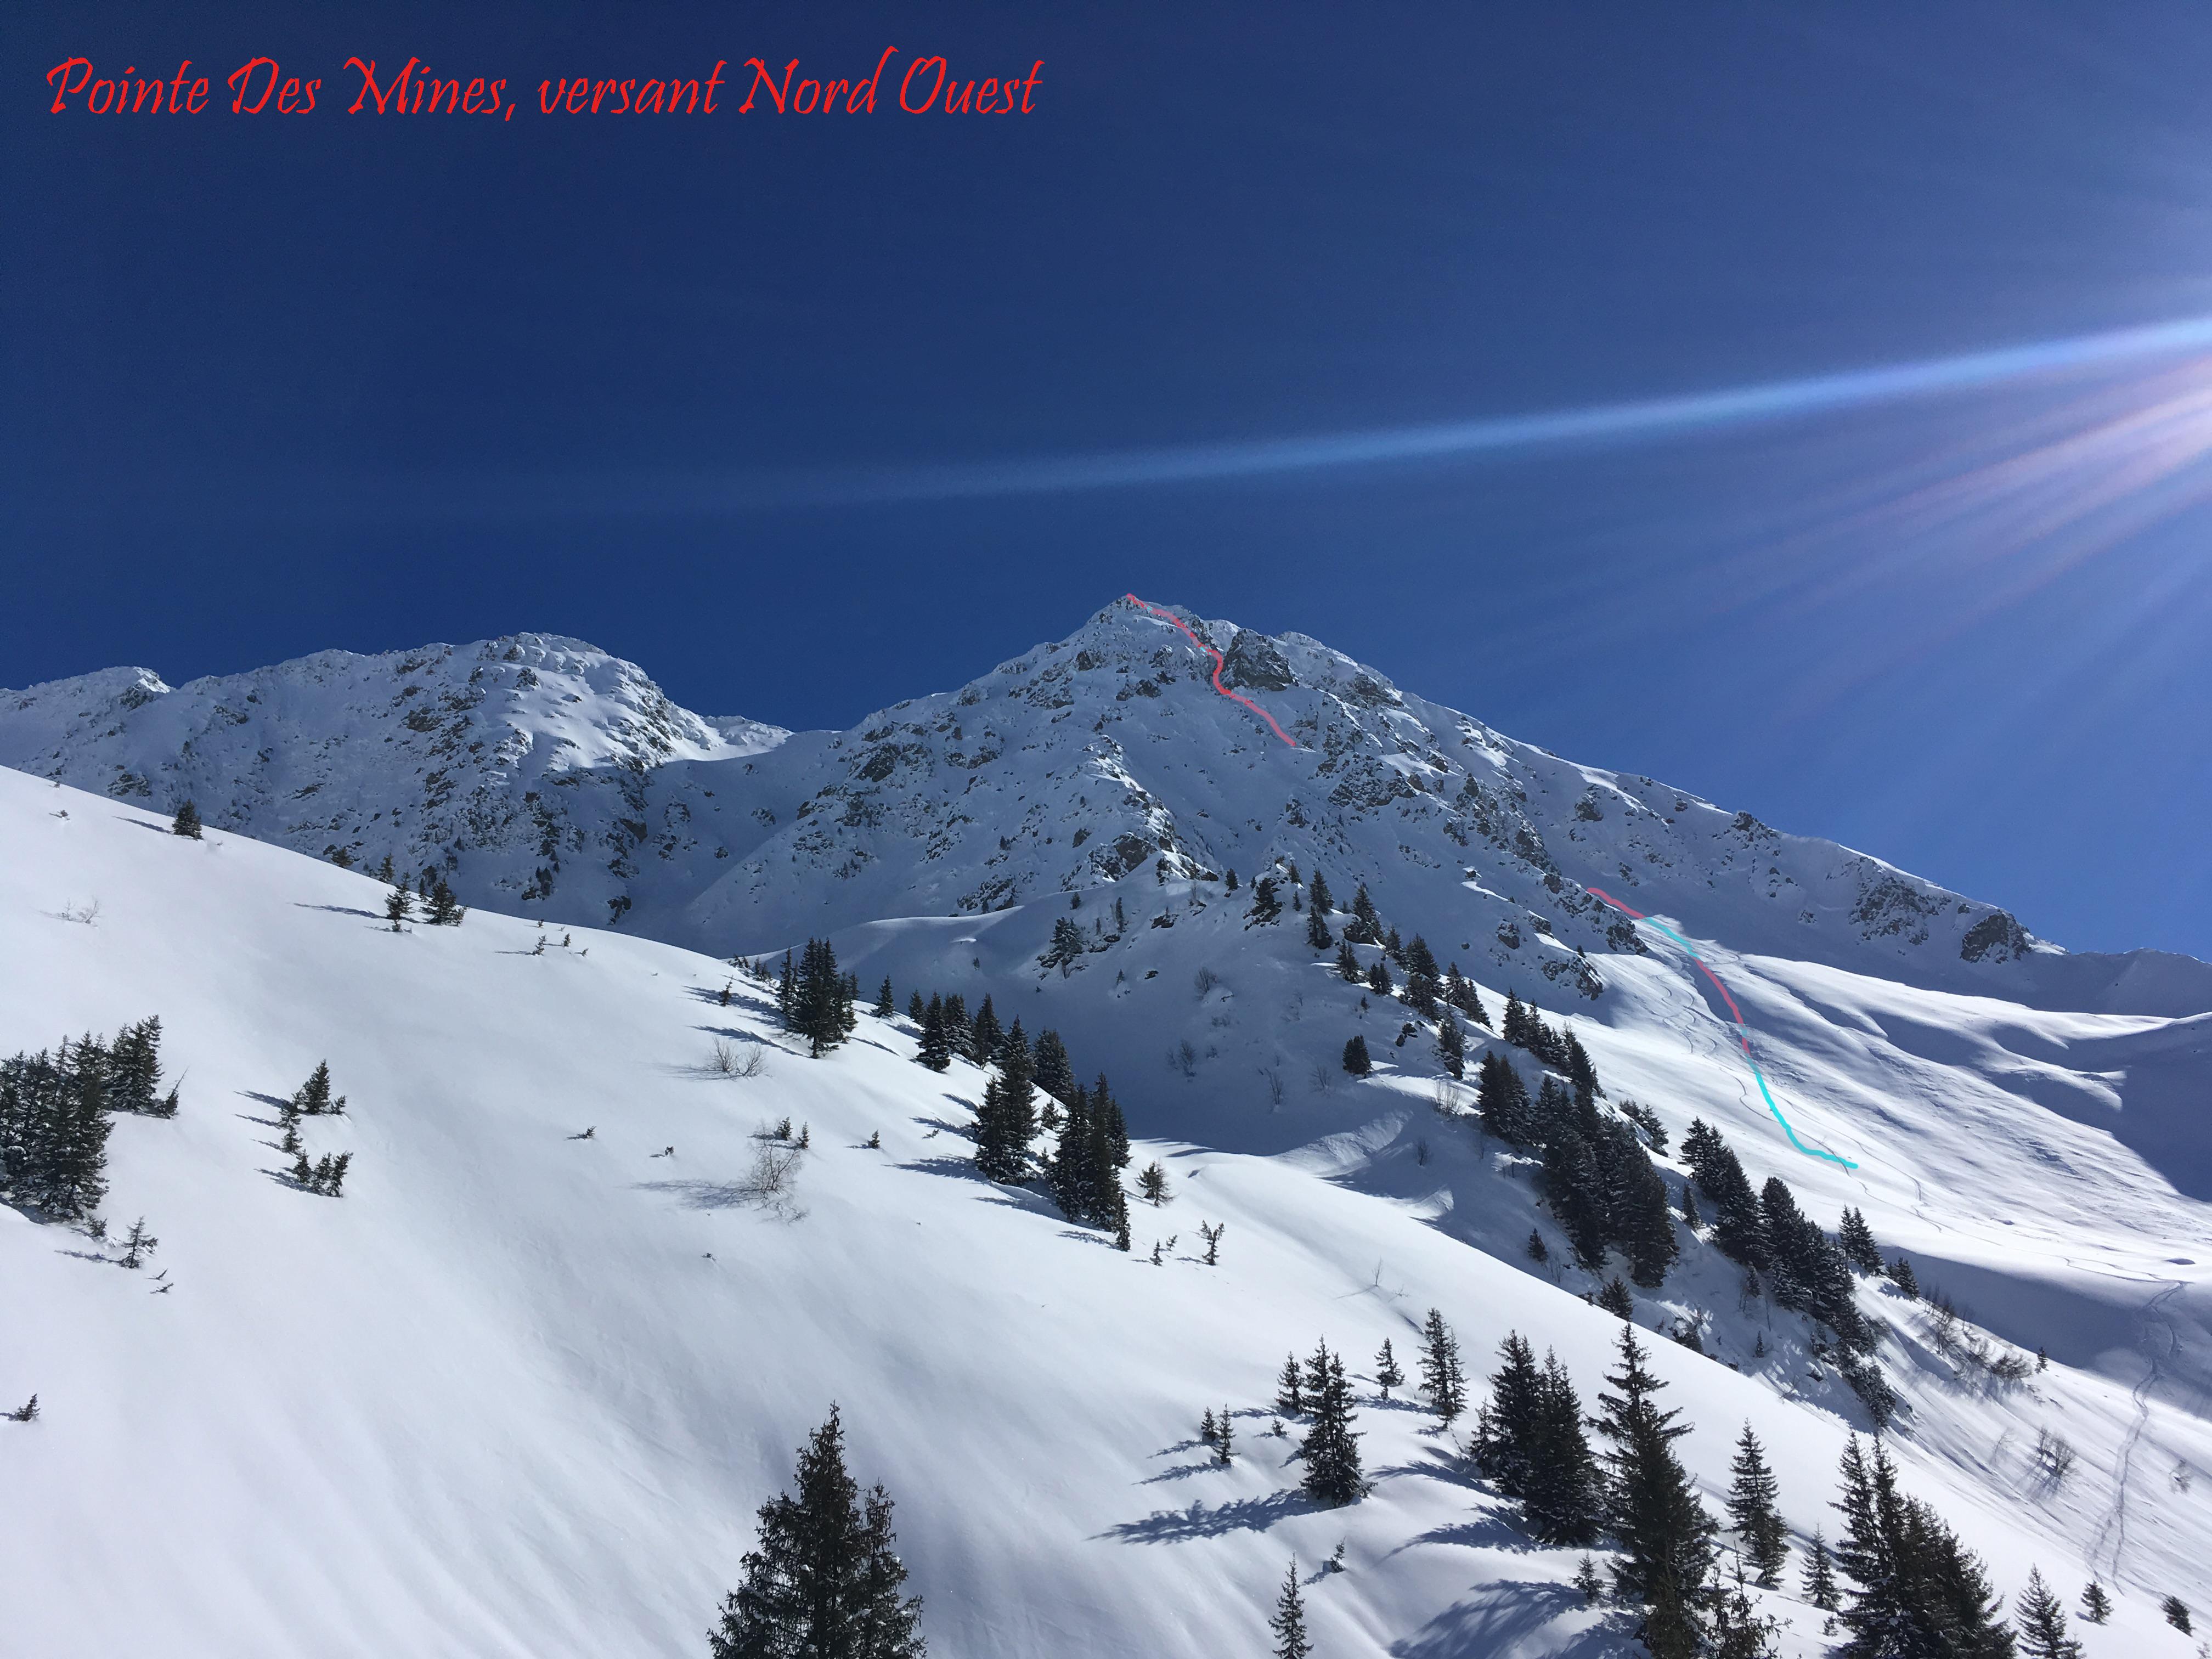 Topo Photo Pointe des Mines versant Nord Ouest